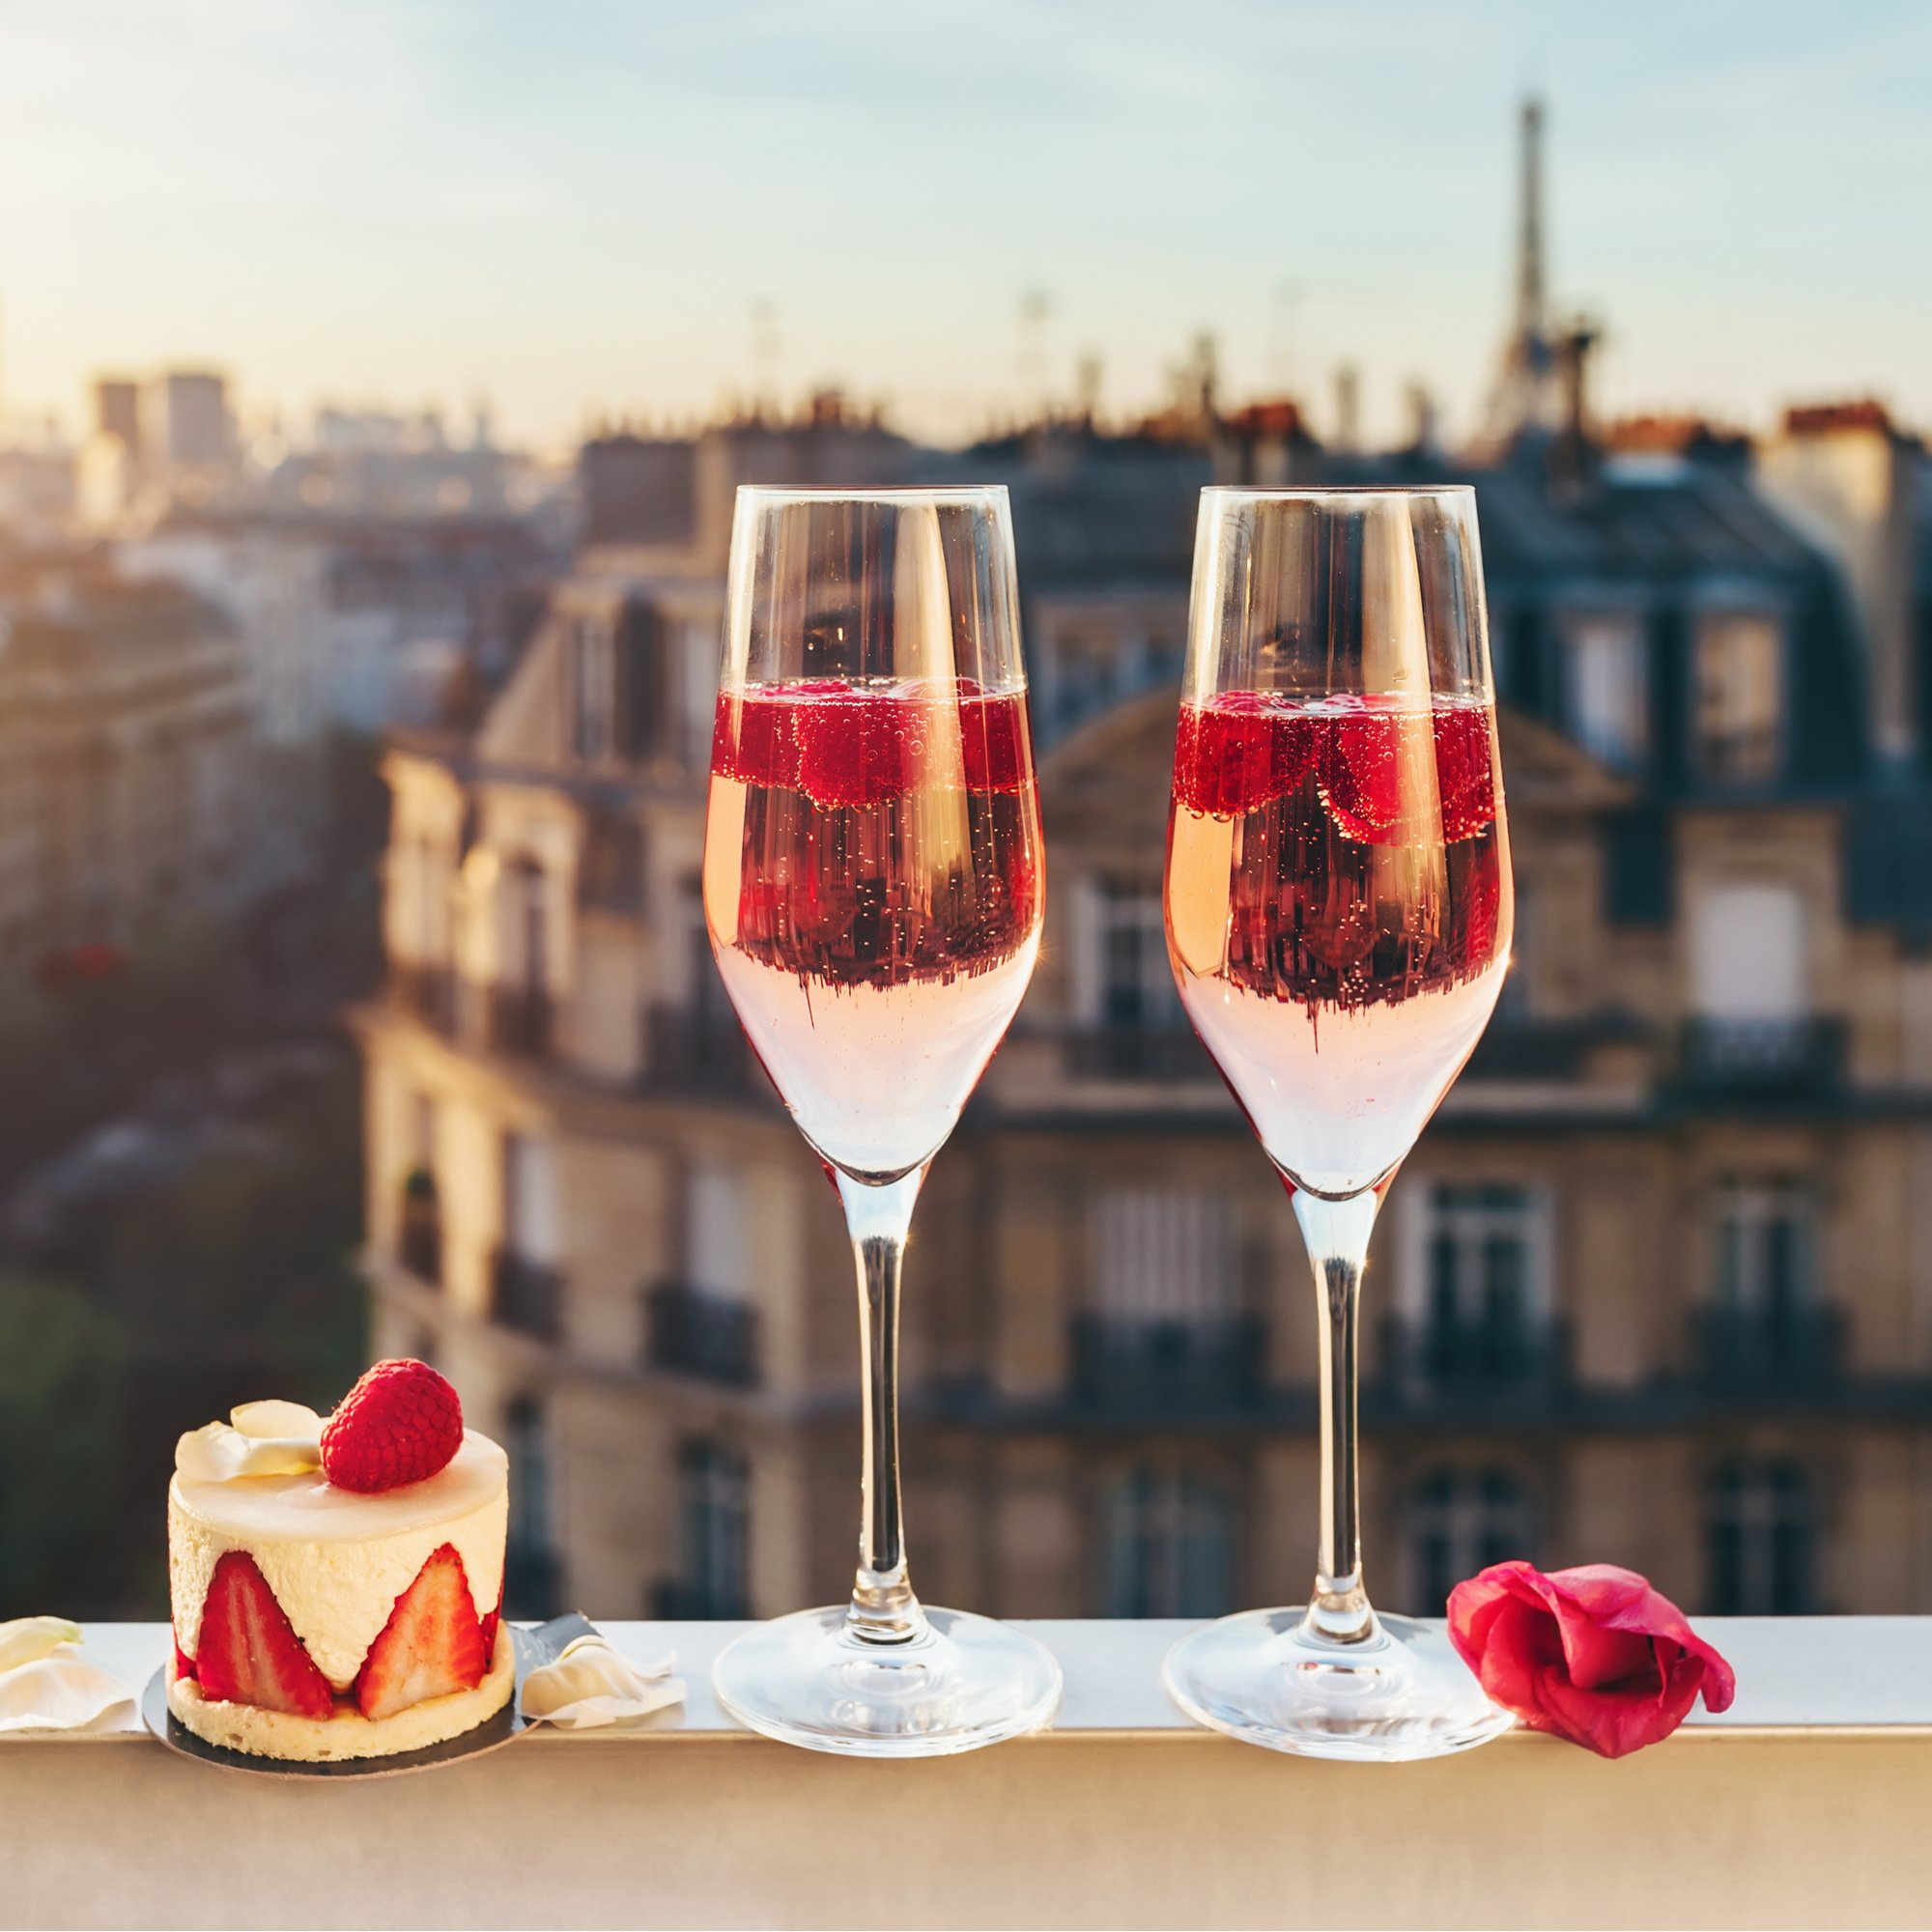 Lifestyle Bild Champagner Balkon mit Himbeeren Amazon Produktfotobearbeitung